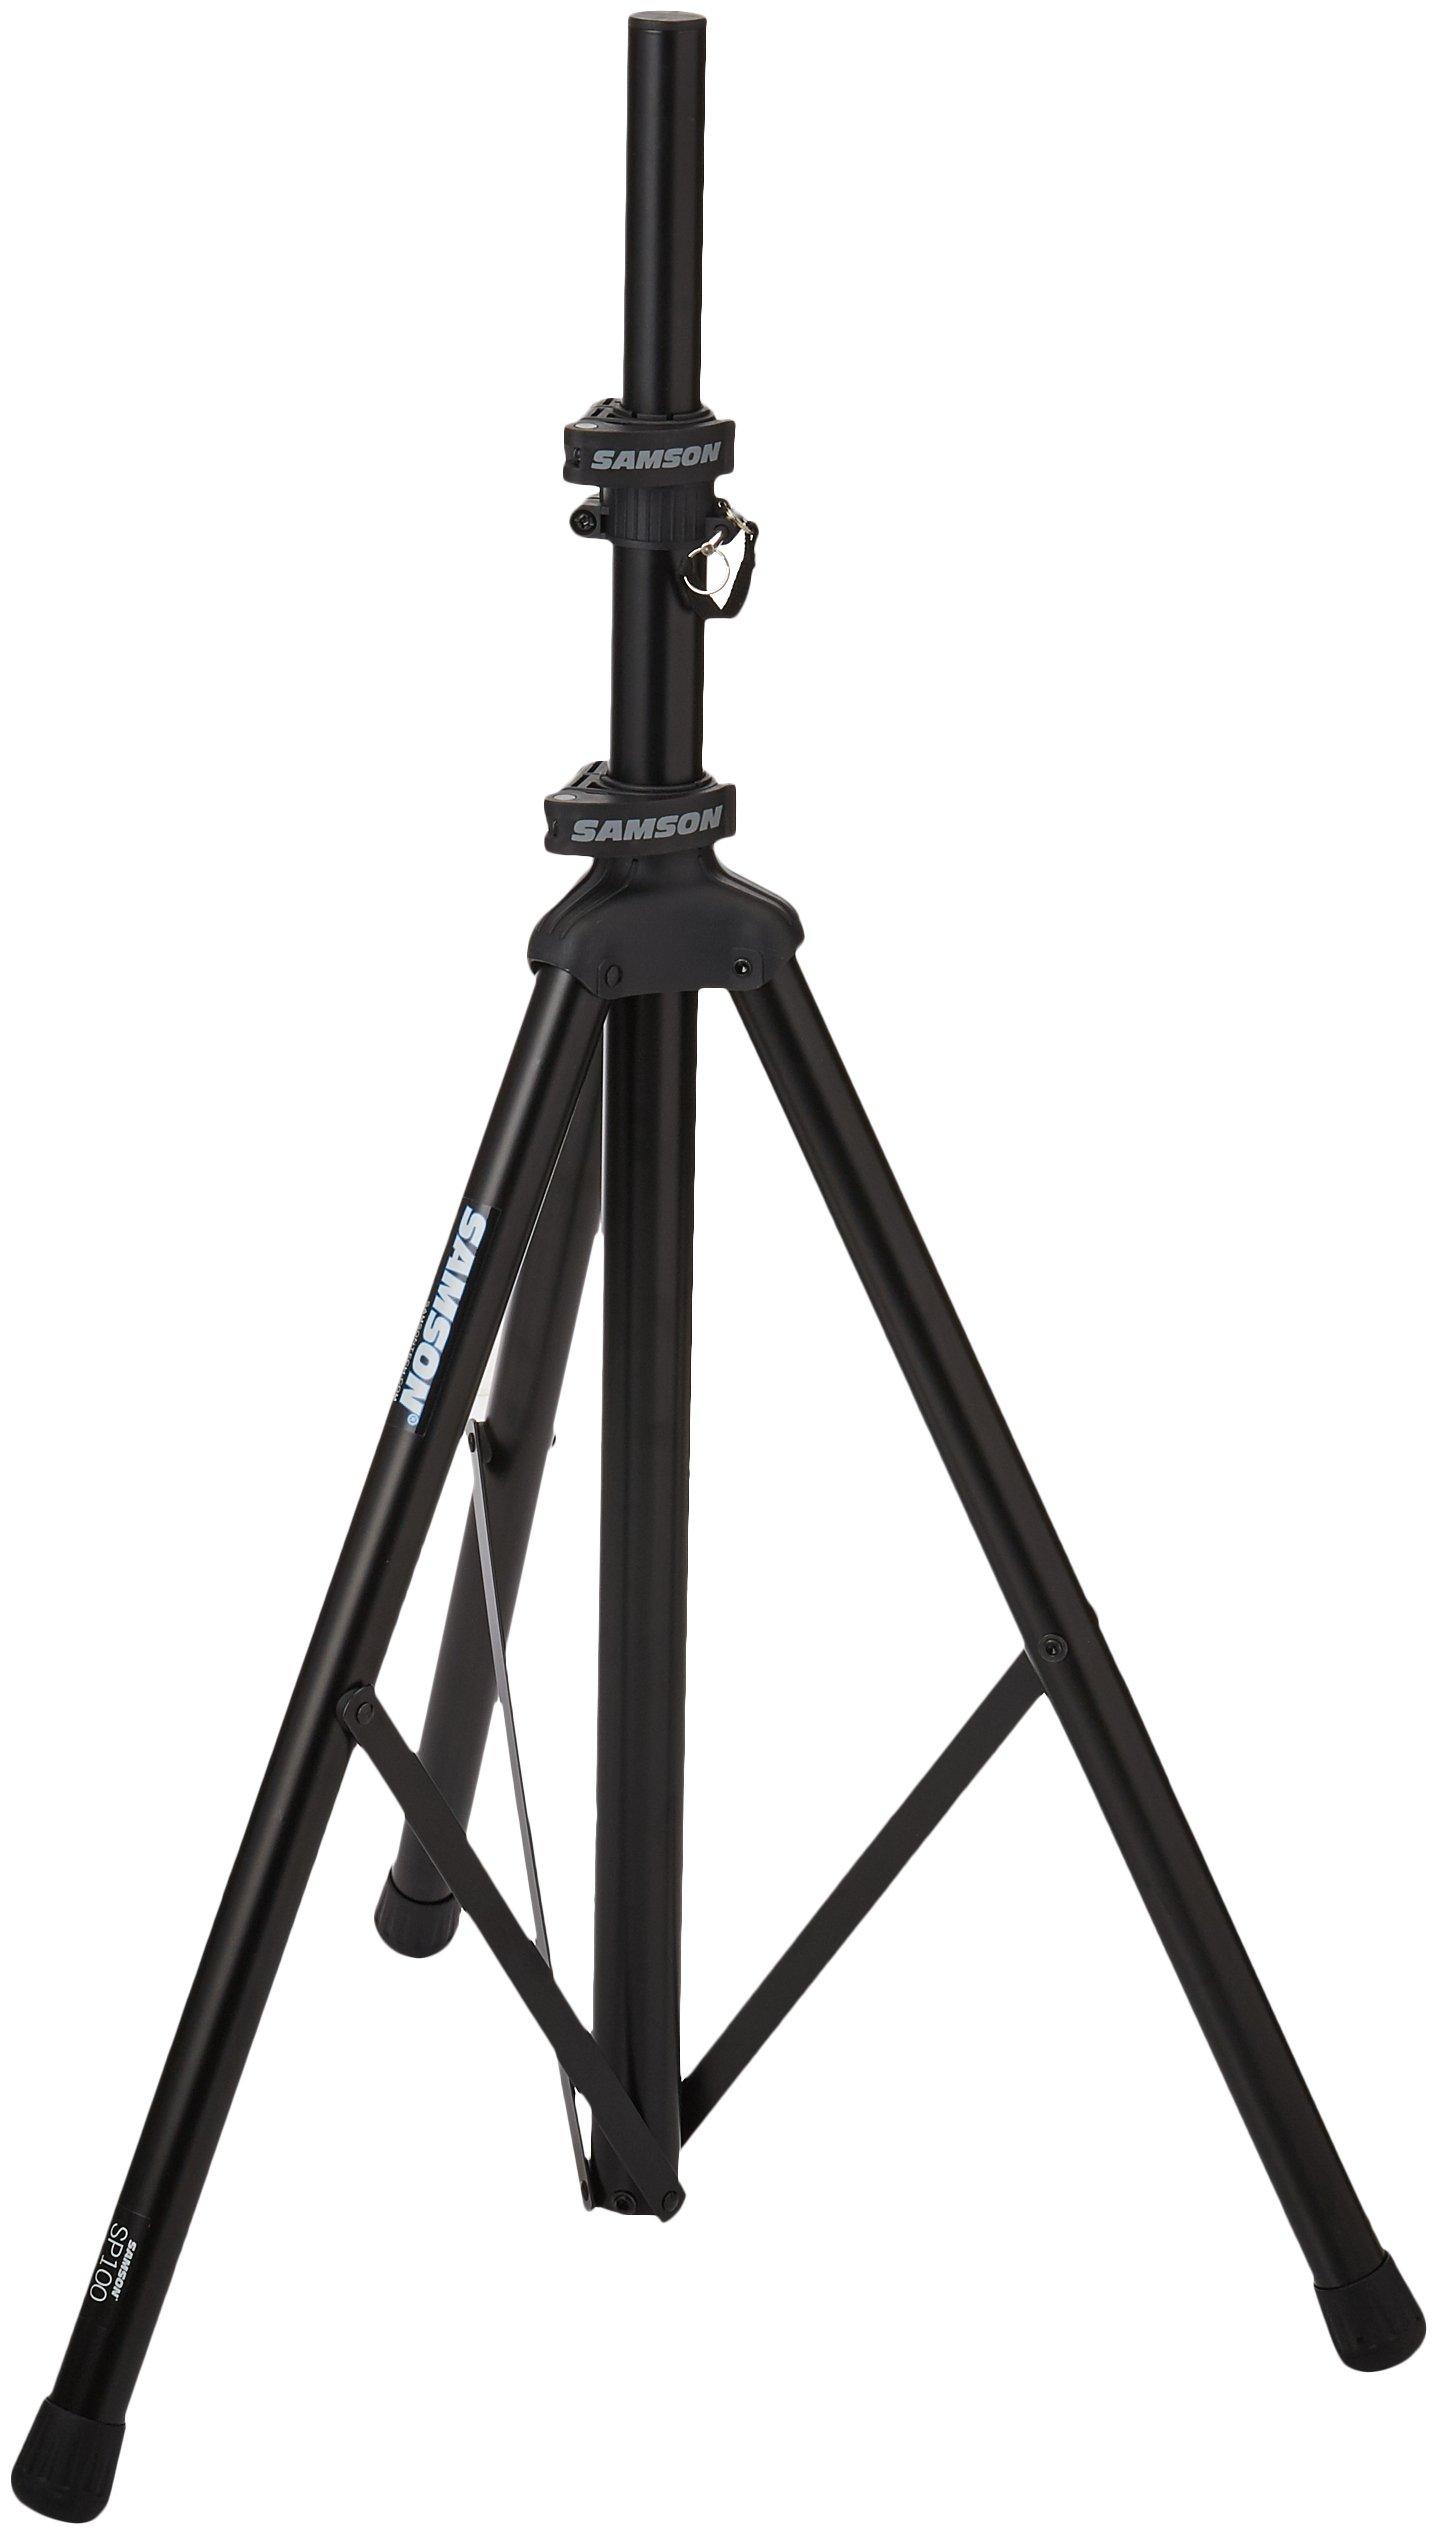 Samson SP100 Speaker Stand (Single Stand)